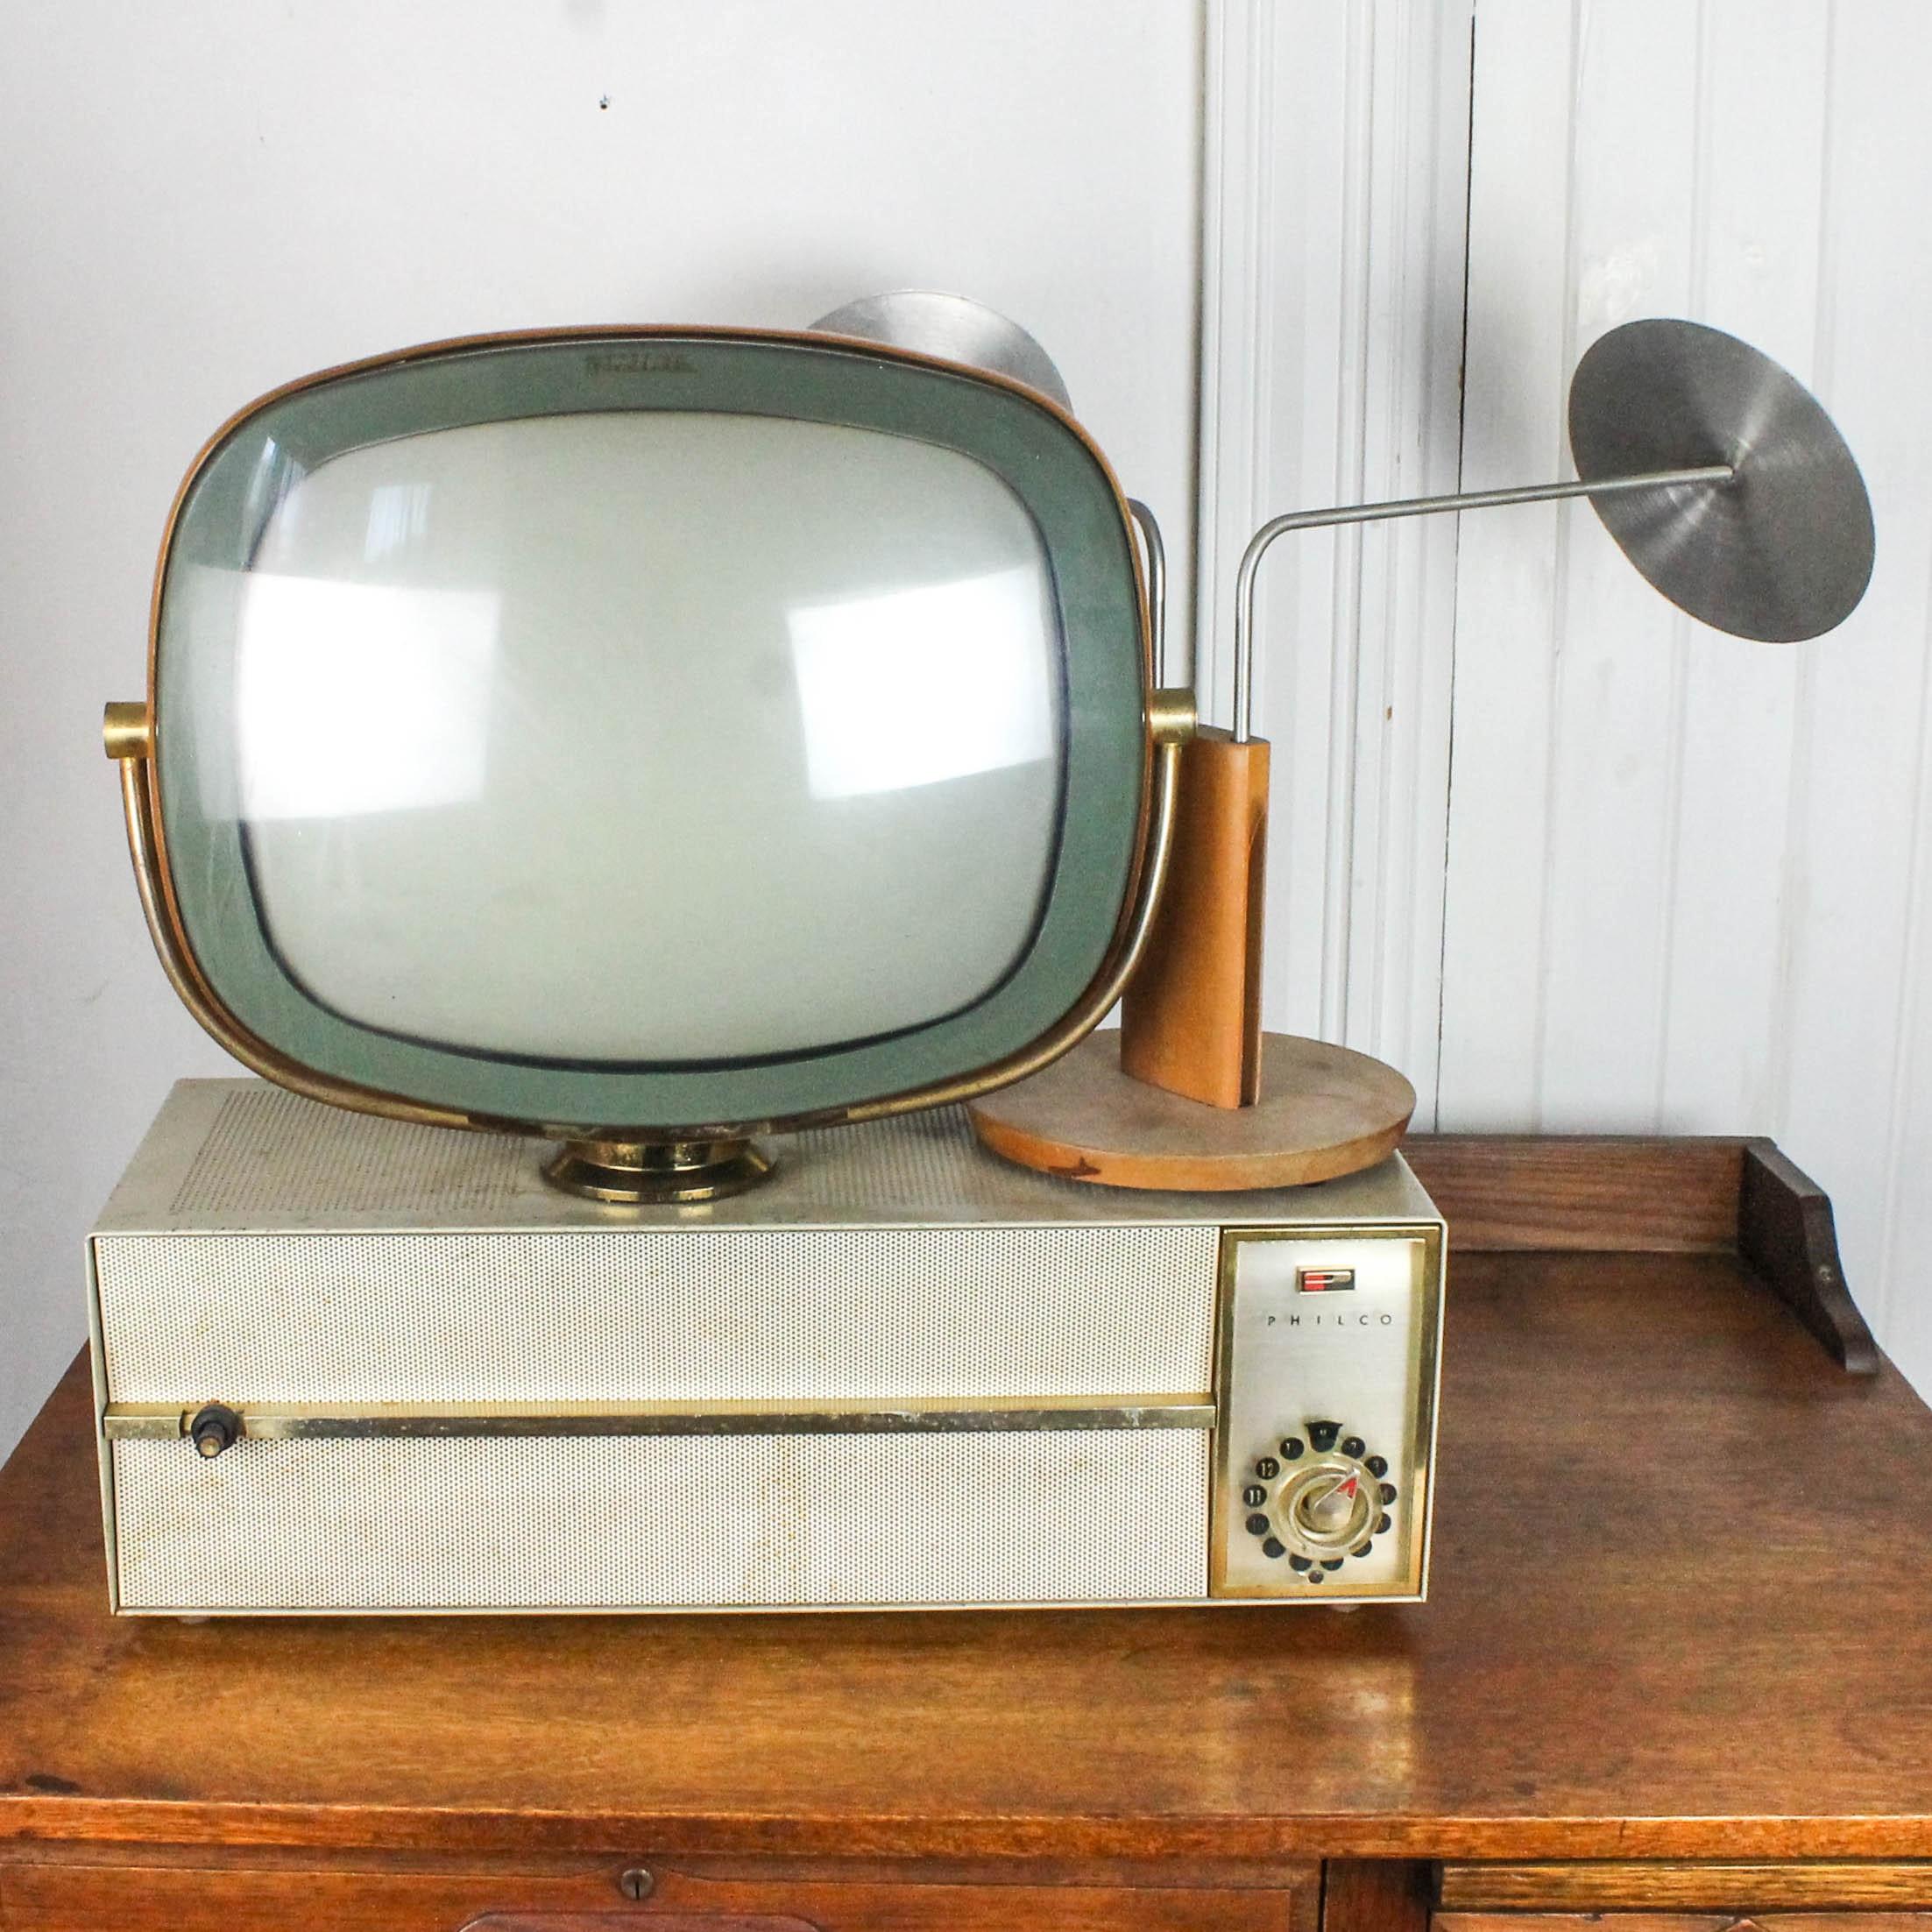 Vintage Philco Predicta Television with Antenna